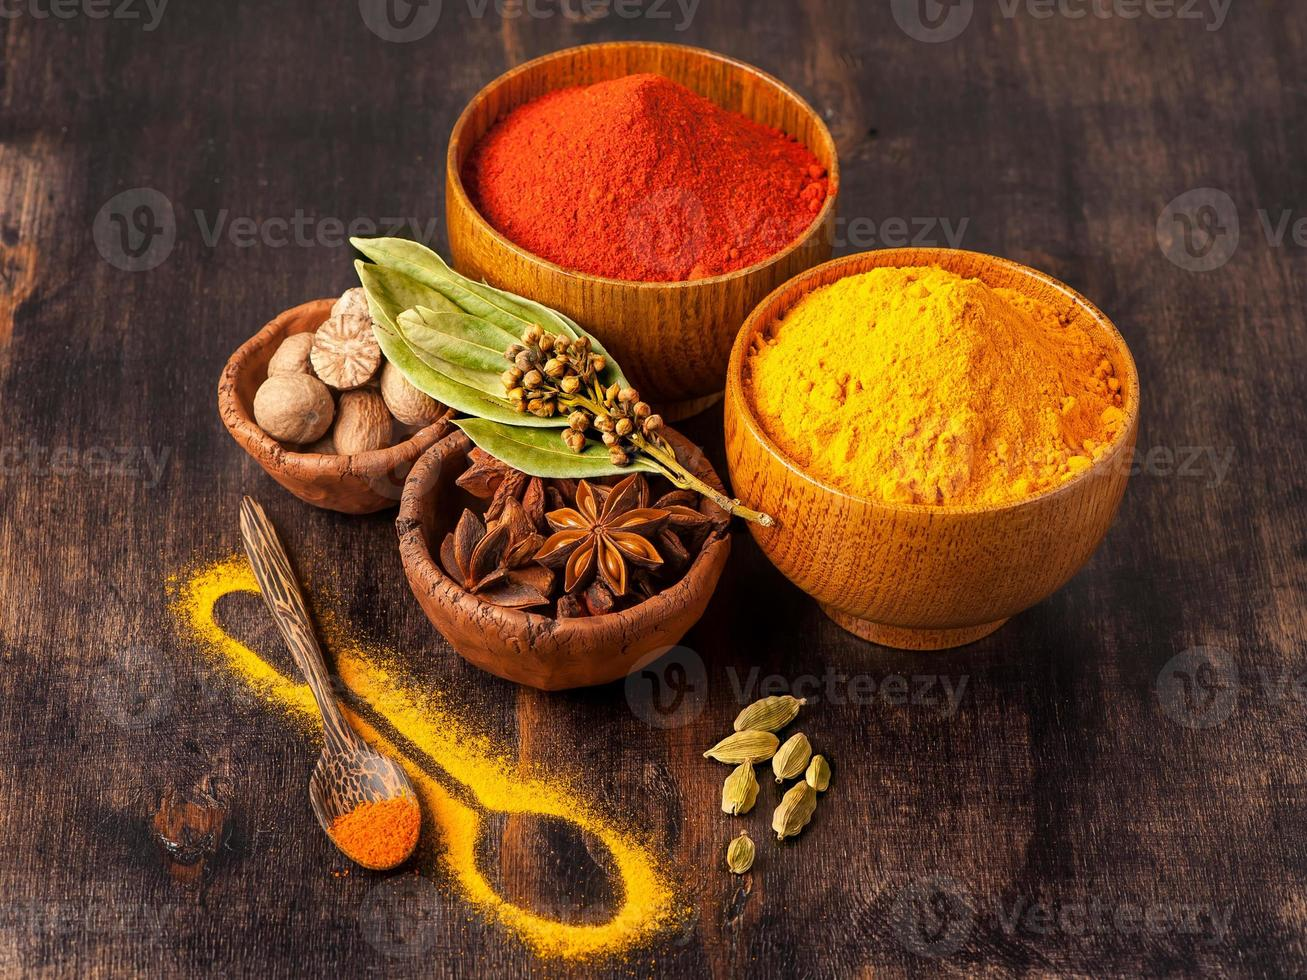 specerijen curry, paprika, nootmuskaat, steranijs, kardemom. foto